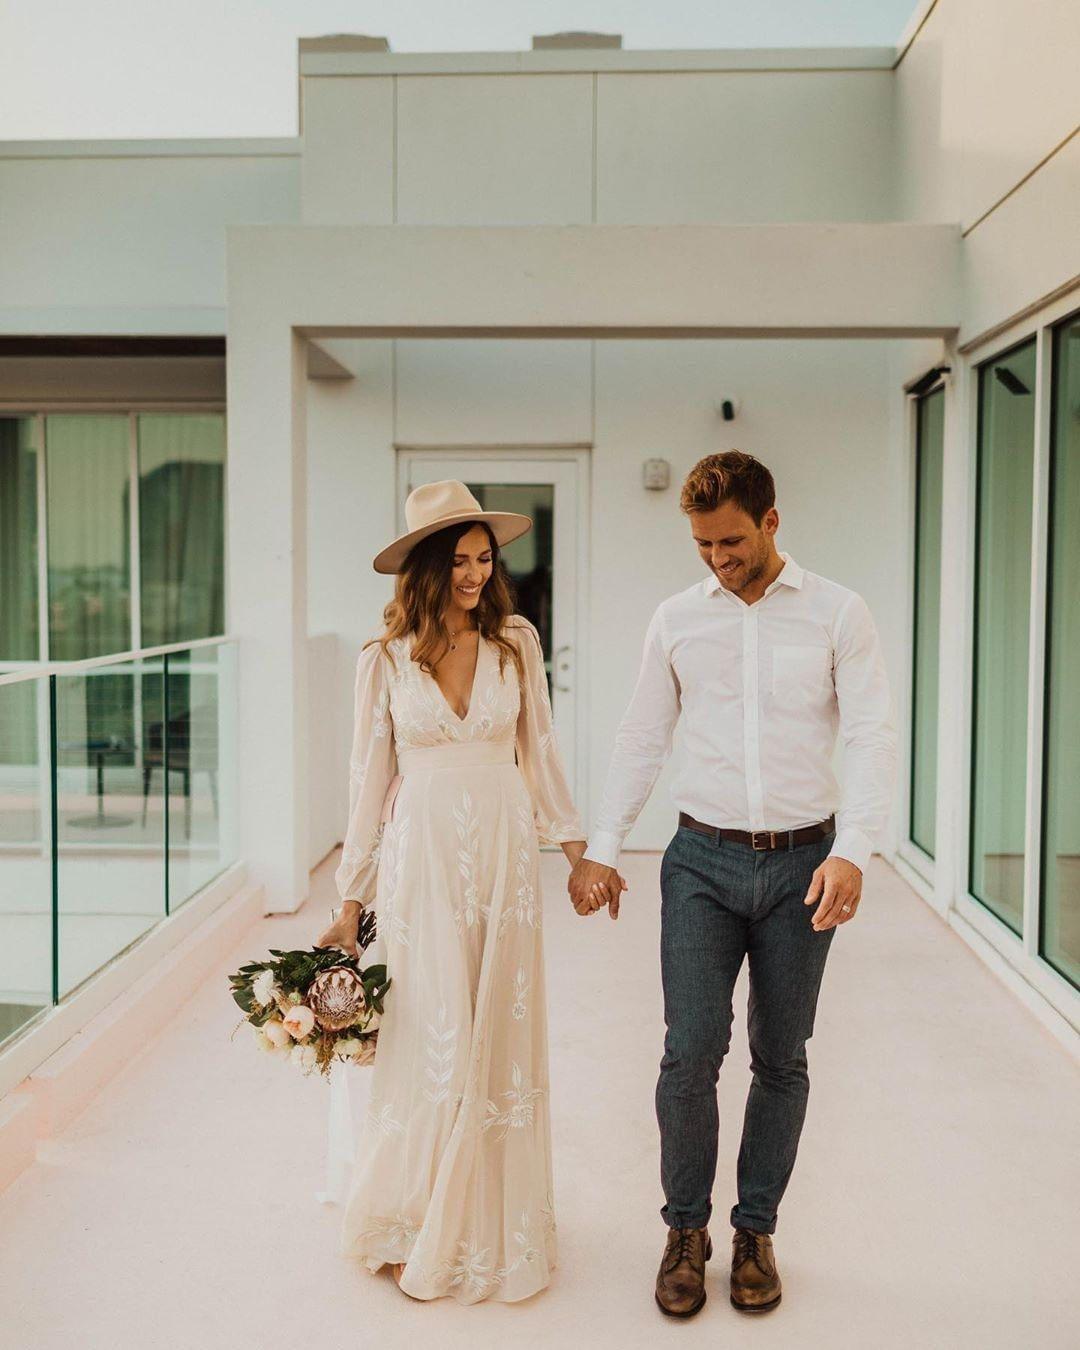 Bhldn Belize Dress Casual Wedding Attire Groom Wedding Attire Casual Beach Wedding [ 1350 x 1080 Pixel ]